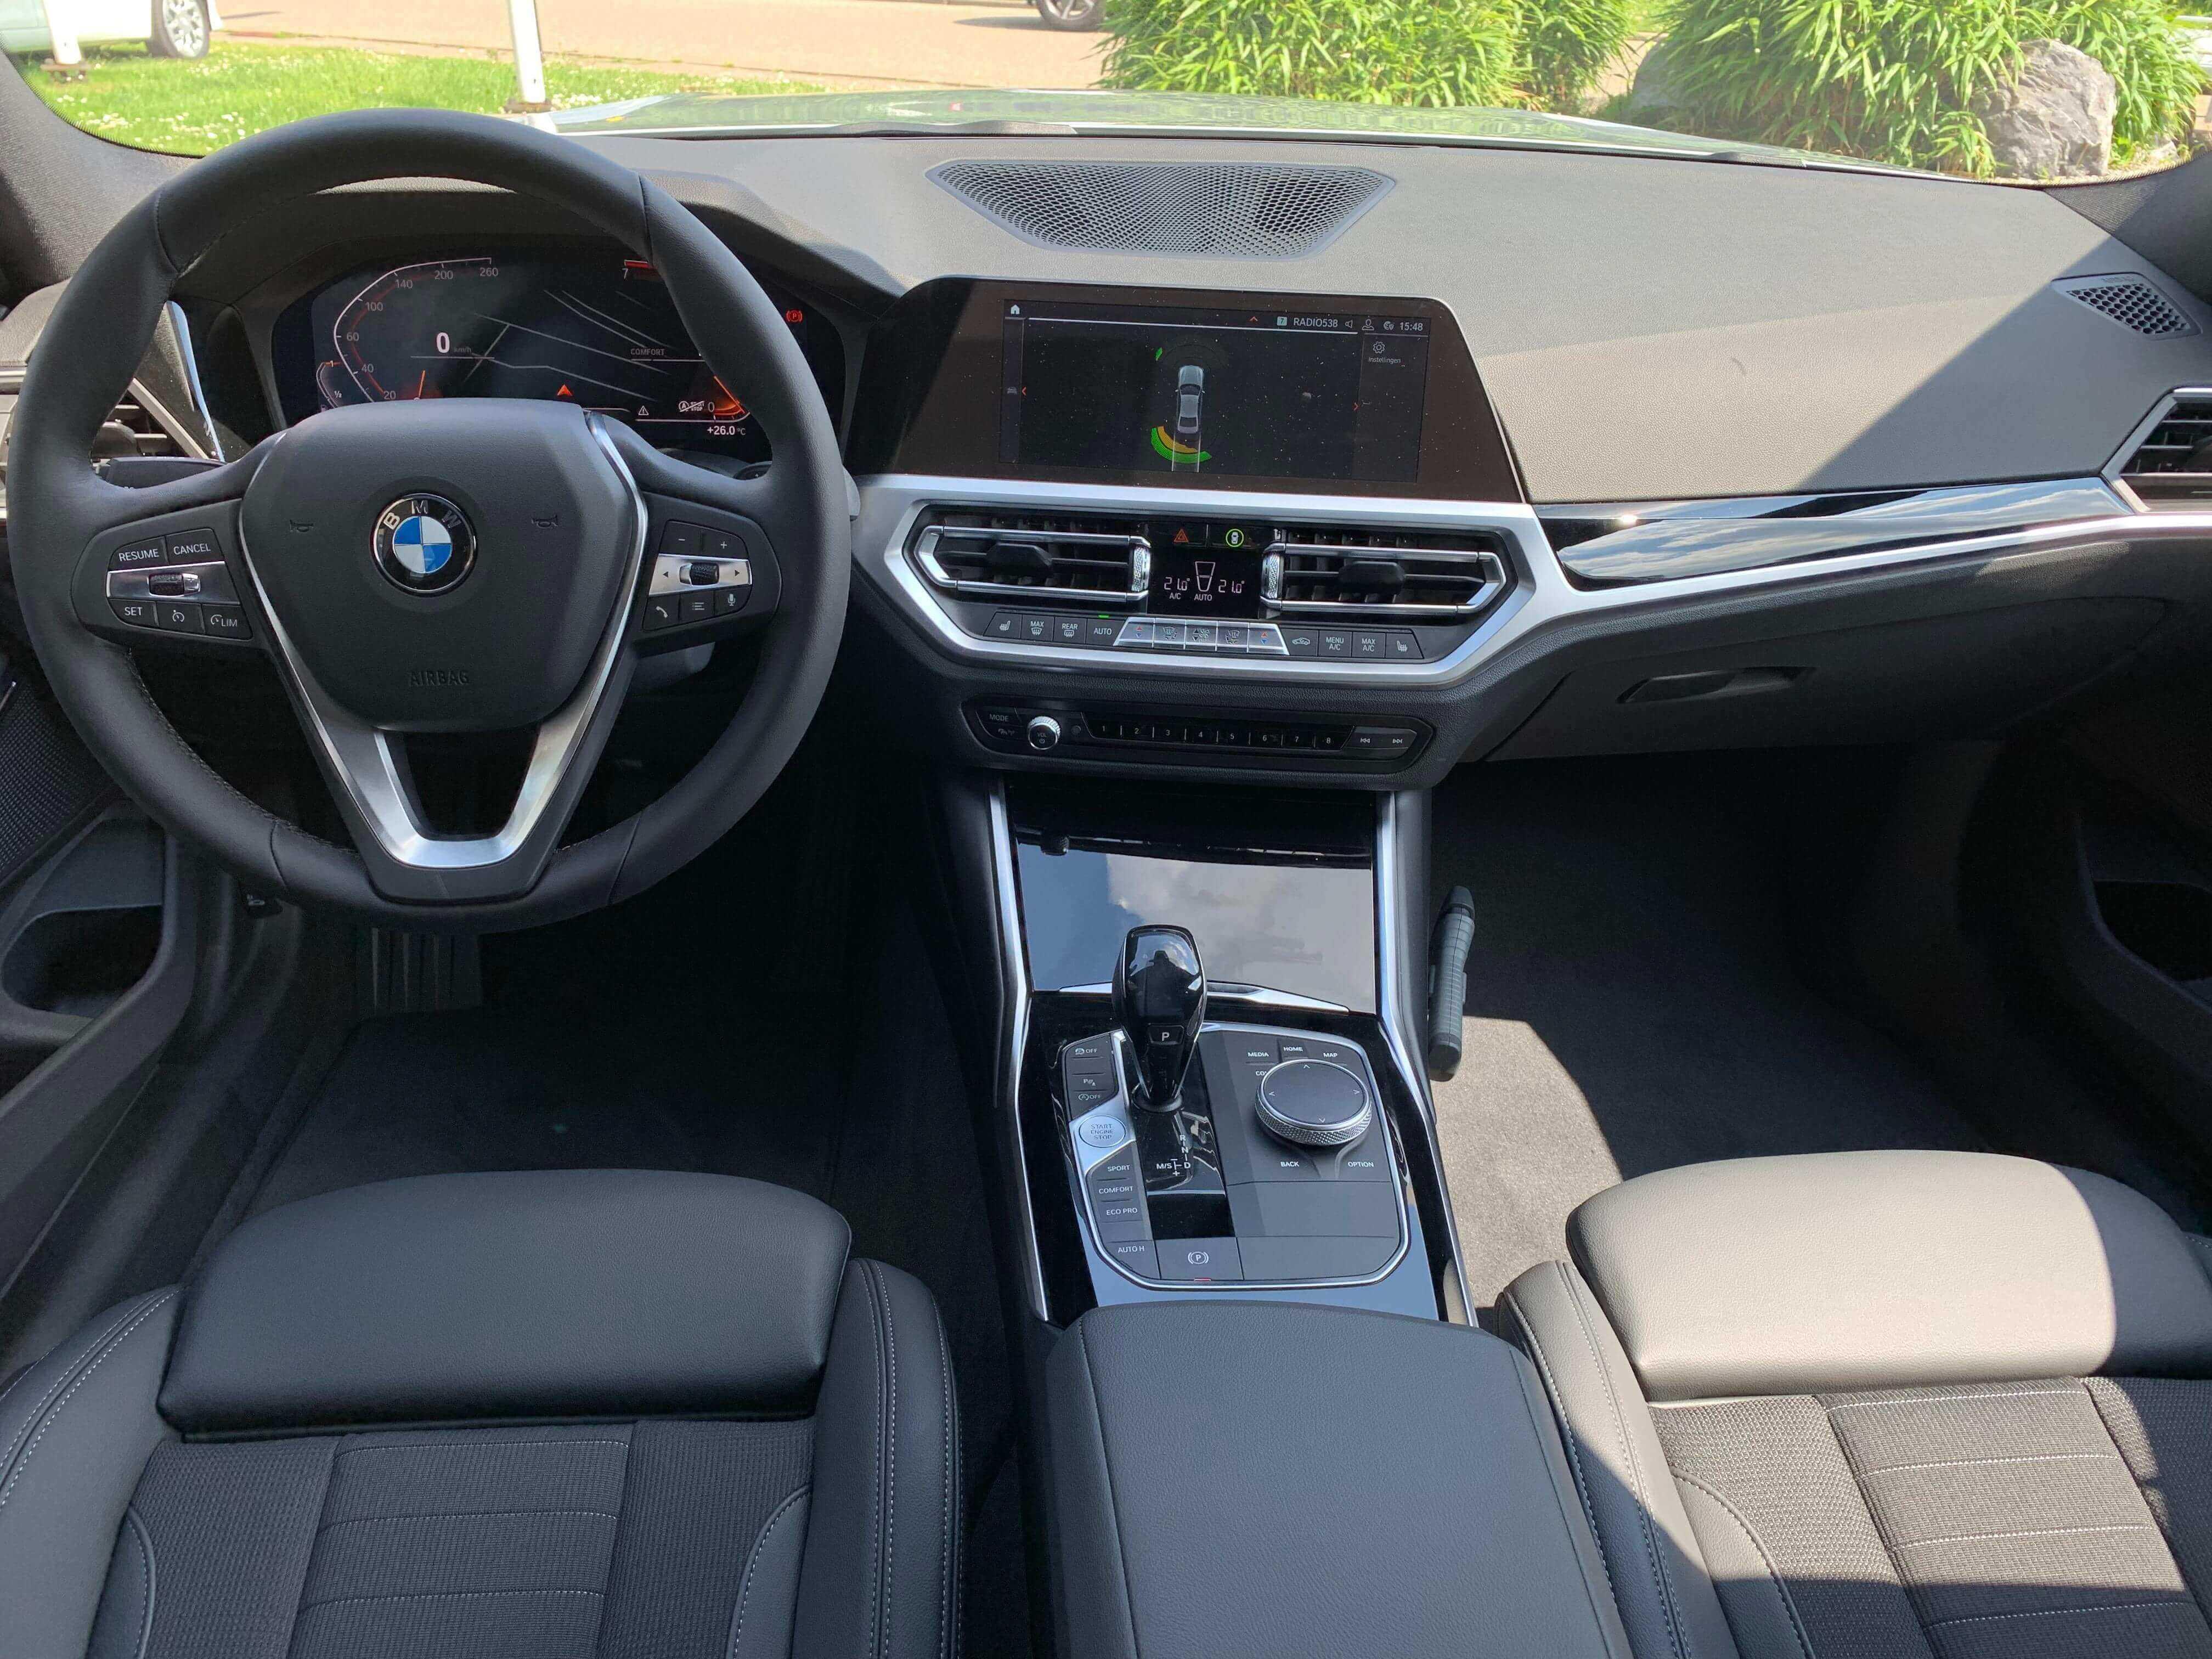 BMW 3 serie sedan 320ia binnenkant